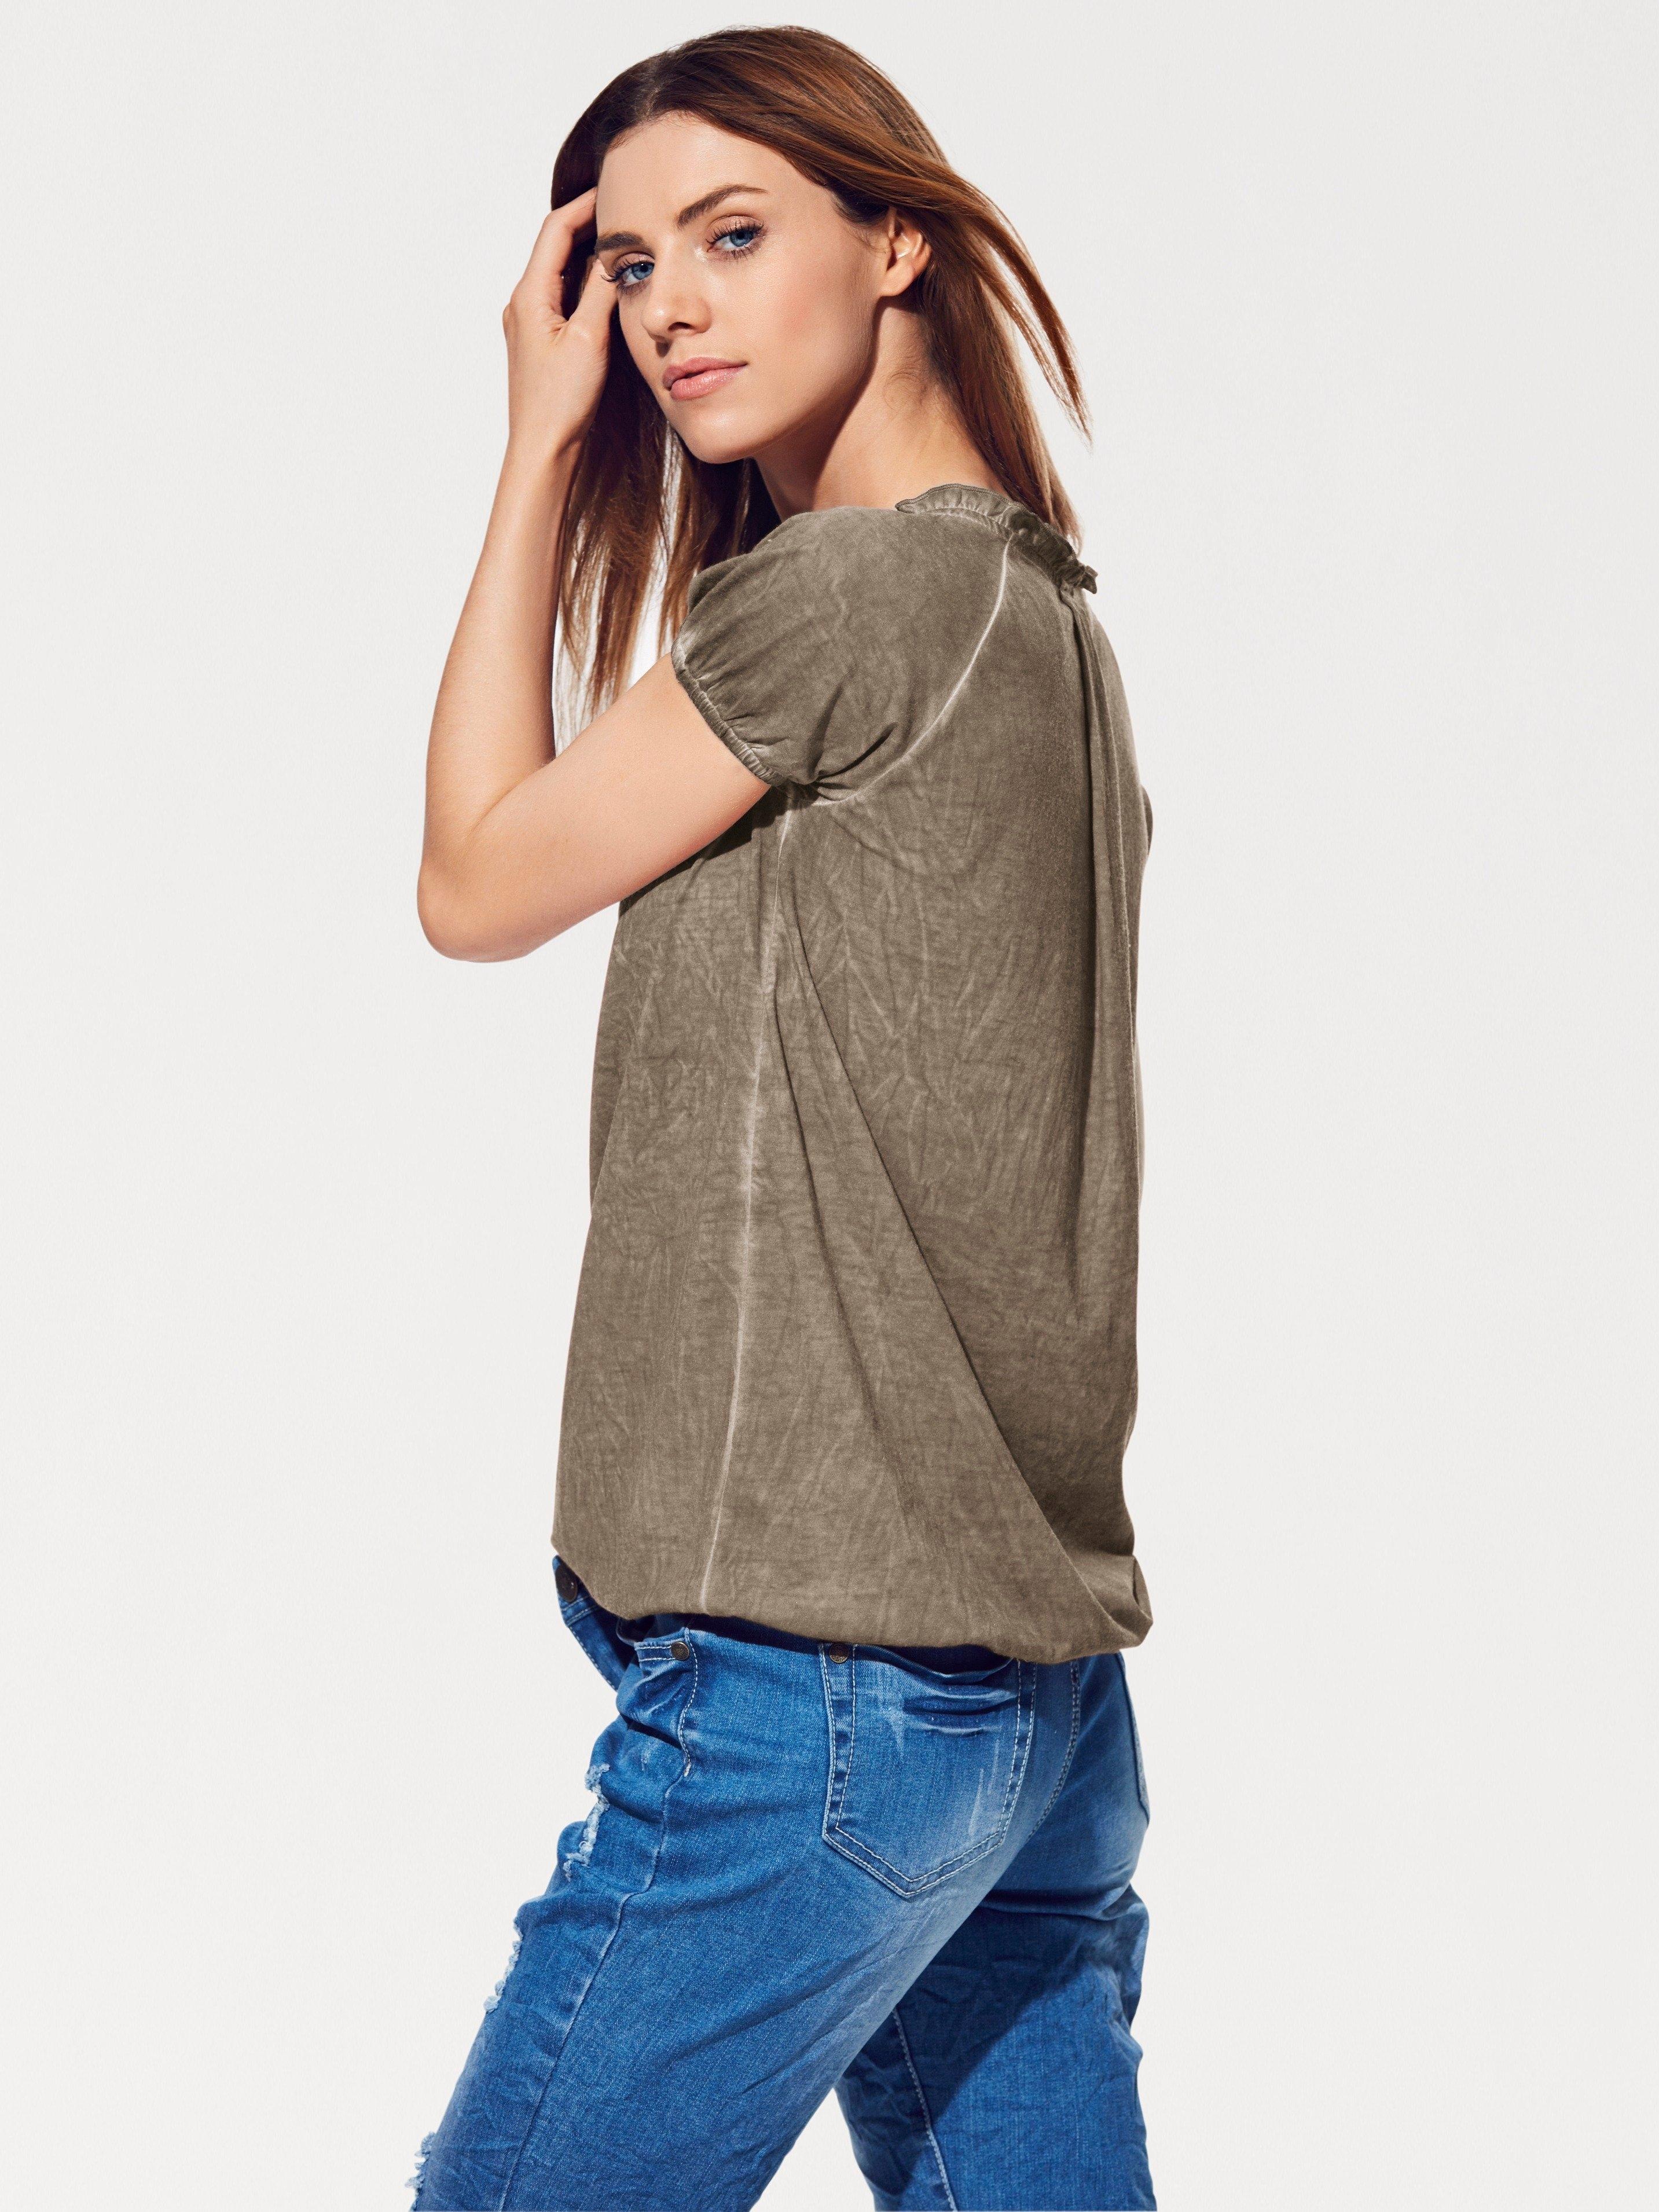 Online T shirt Online Bestellen T shirt 7fgyI6Ybv